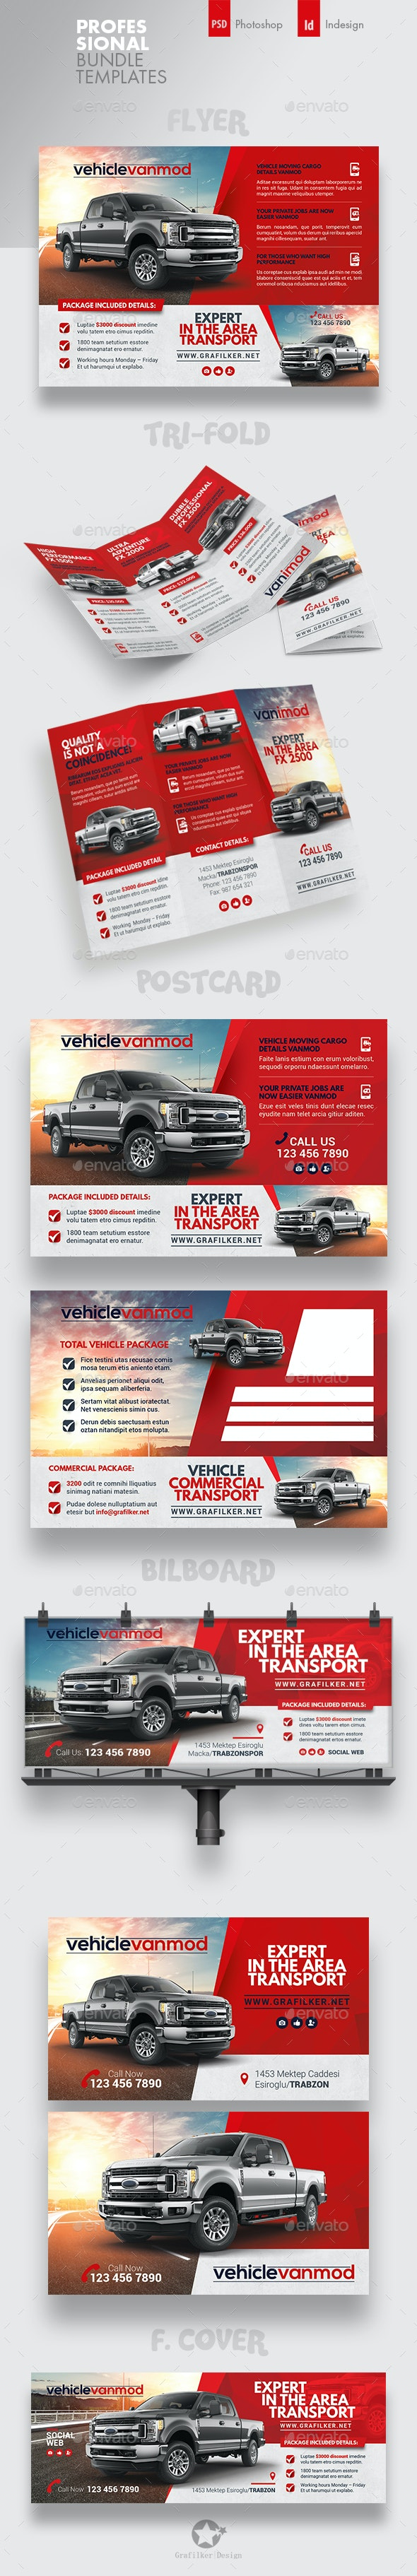 Commercial Vehicle Bundle Templates - Corporate Flyers